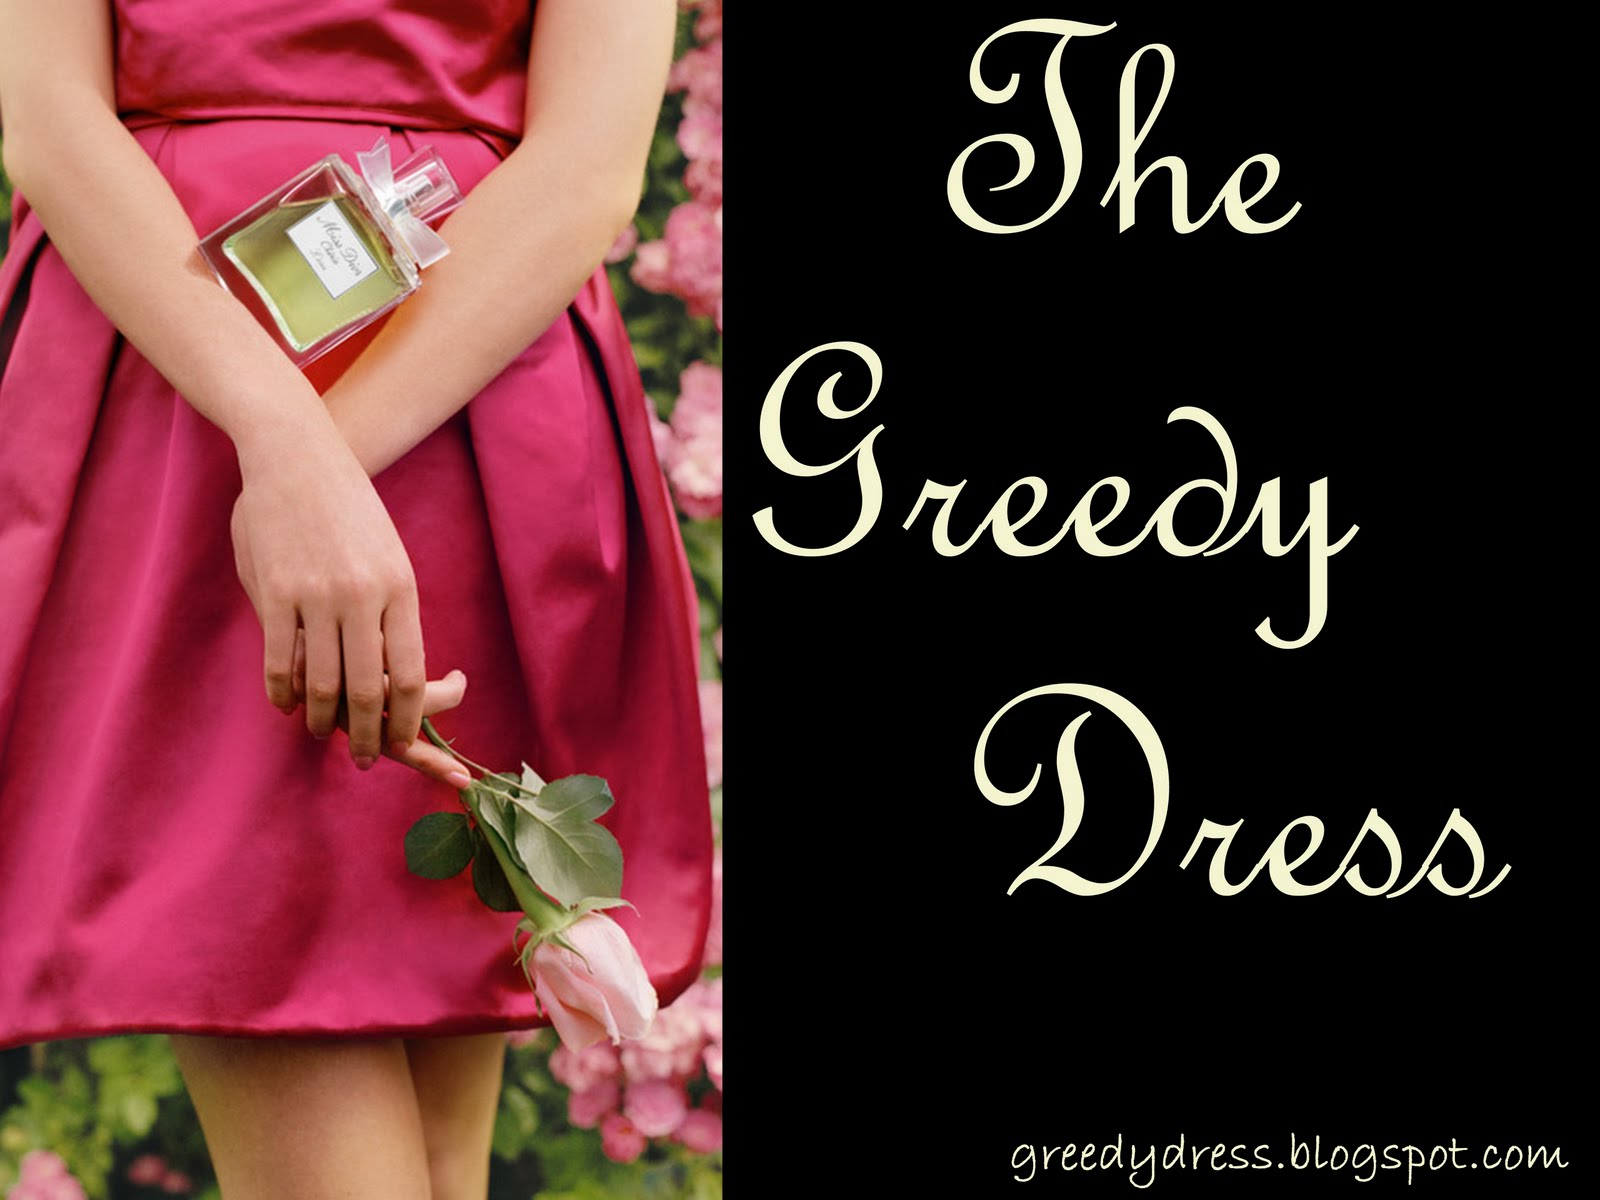 The greedy dress.